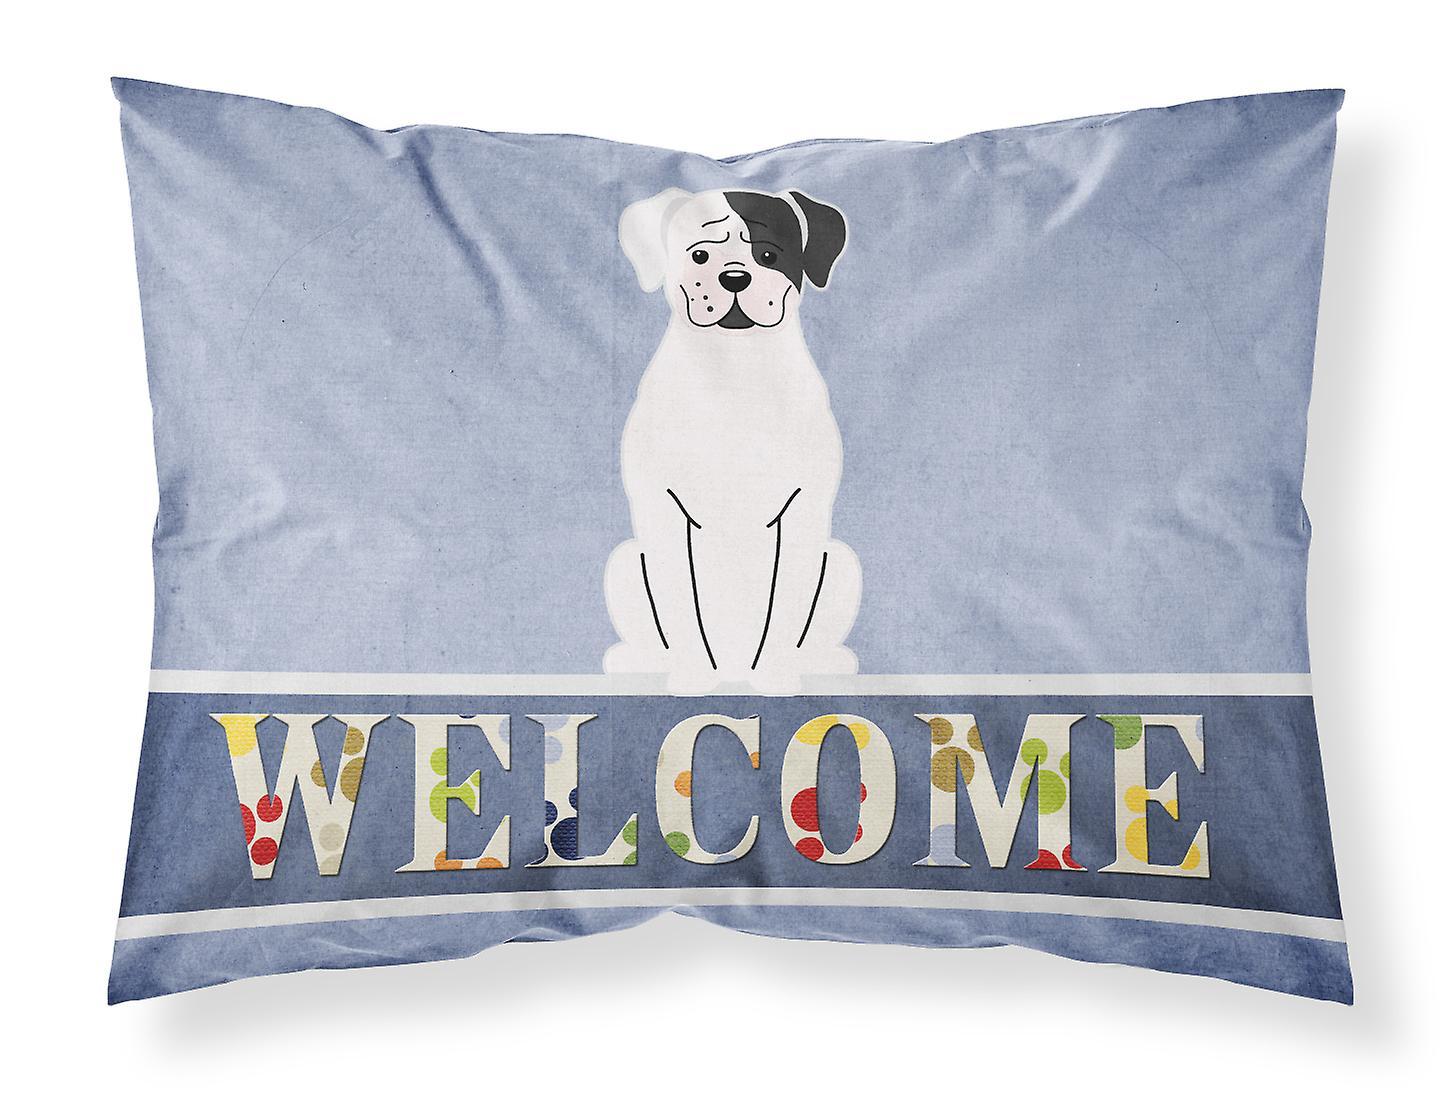 D'oreiller Standard De Cooper Bienvenue Boxer Taie Tissu Blanc n8wNm0